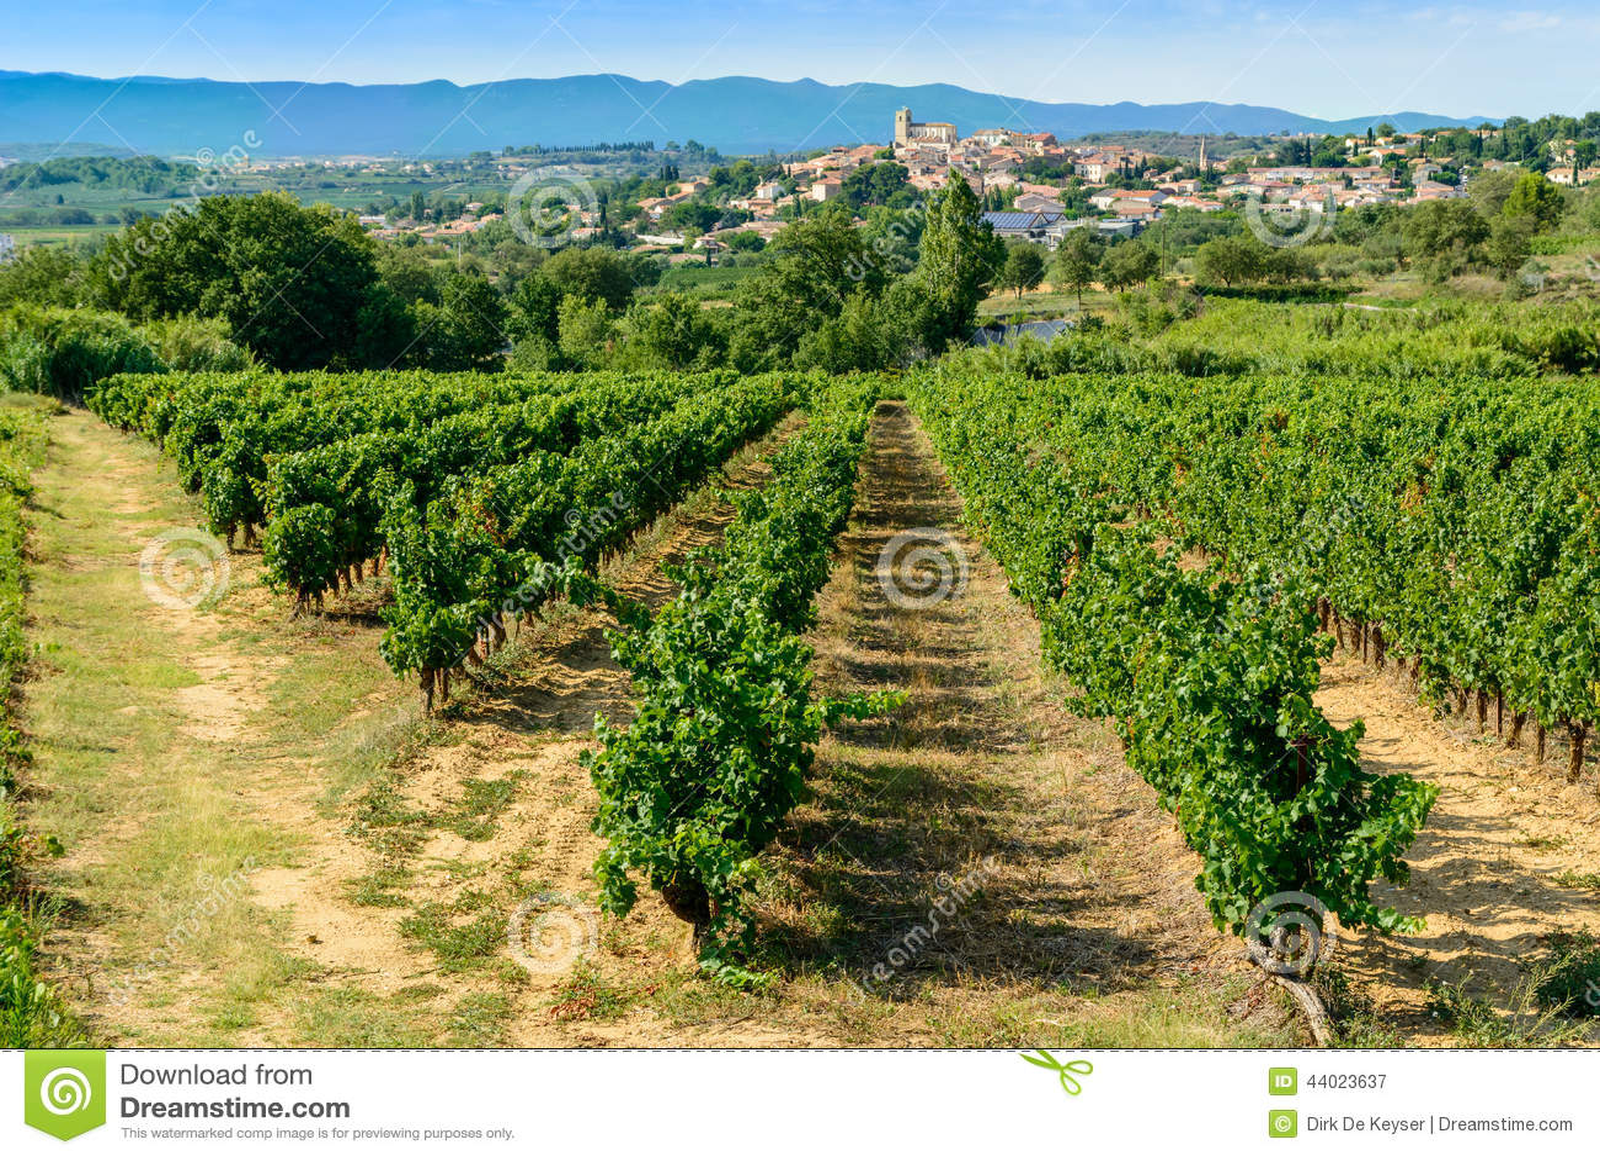 Languedoc vineyards around Beziers Herault France